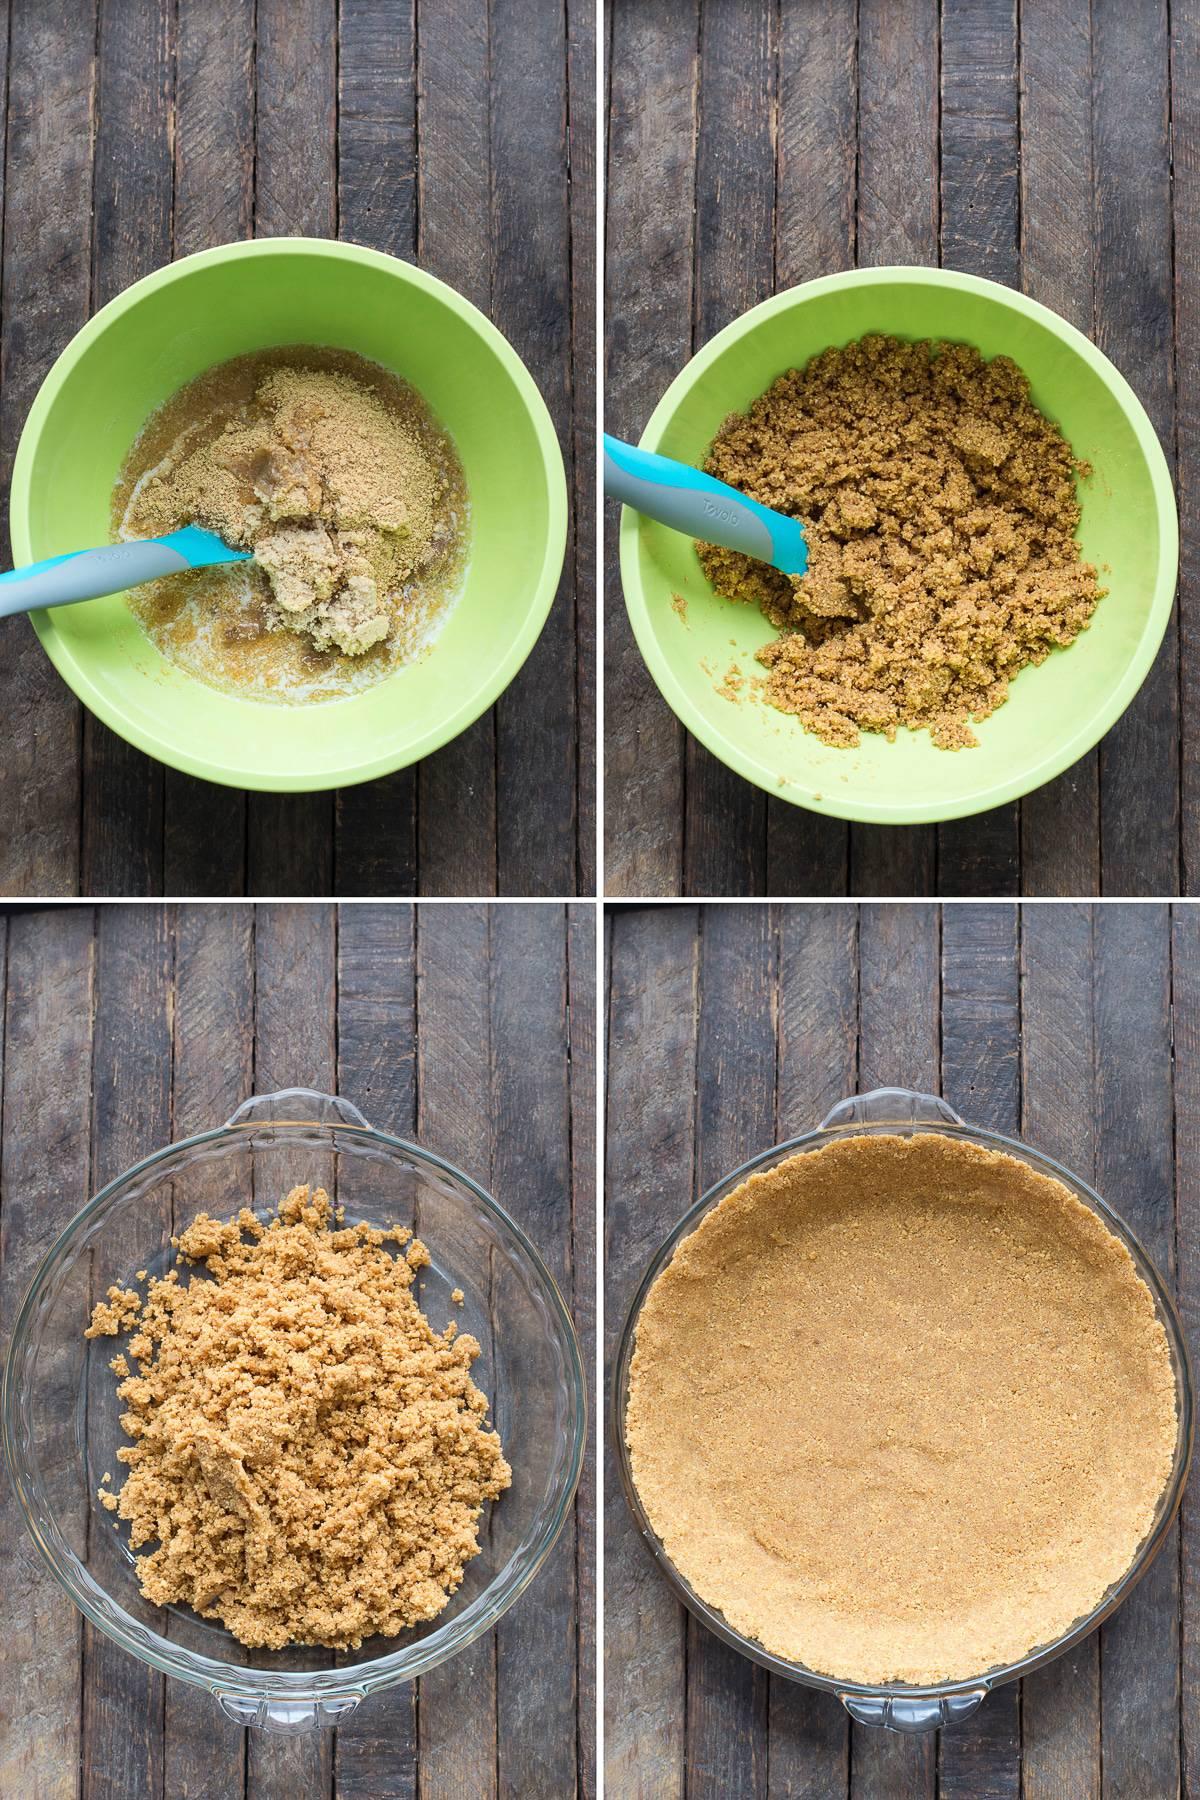 Homemade graham cracker crust - 3 ingredients!